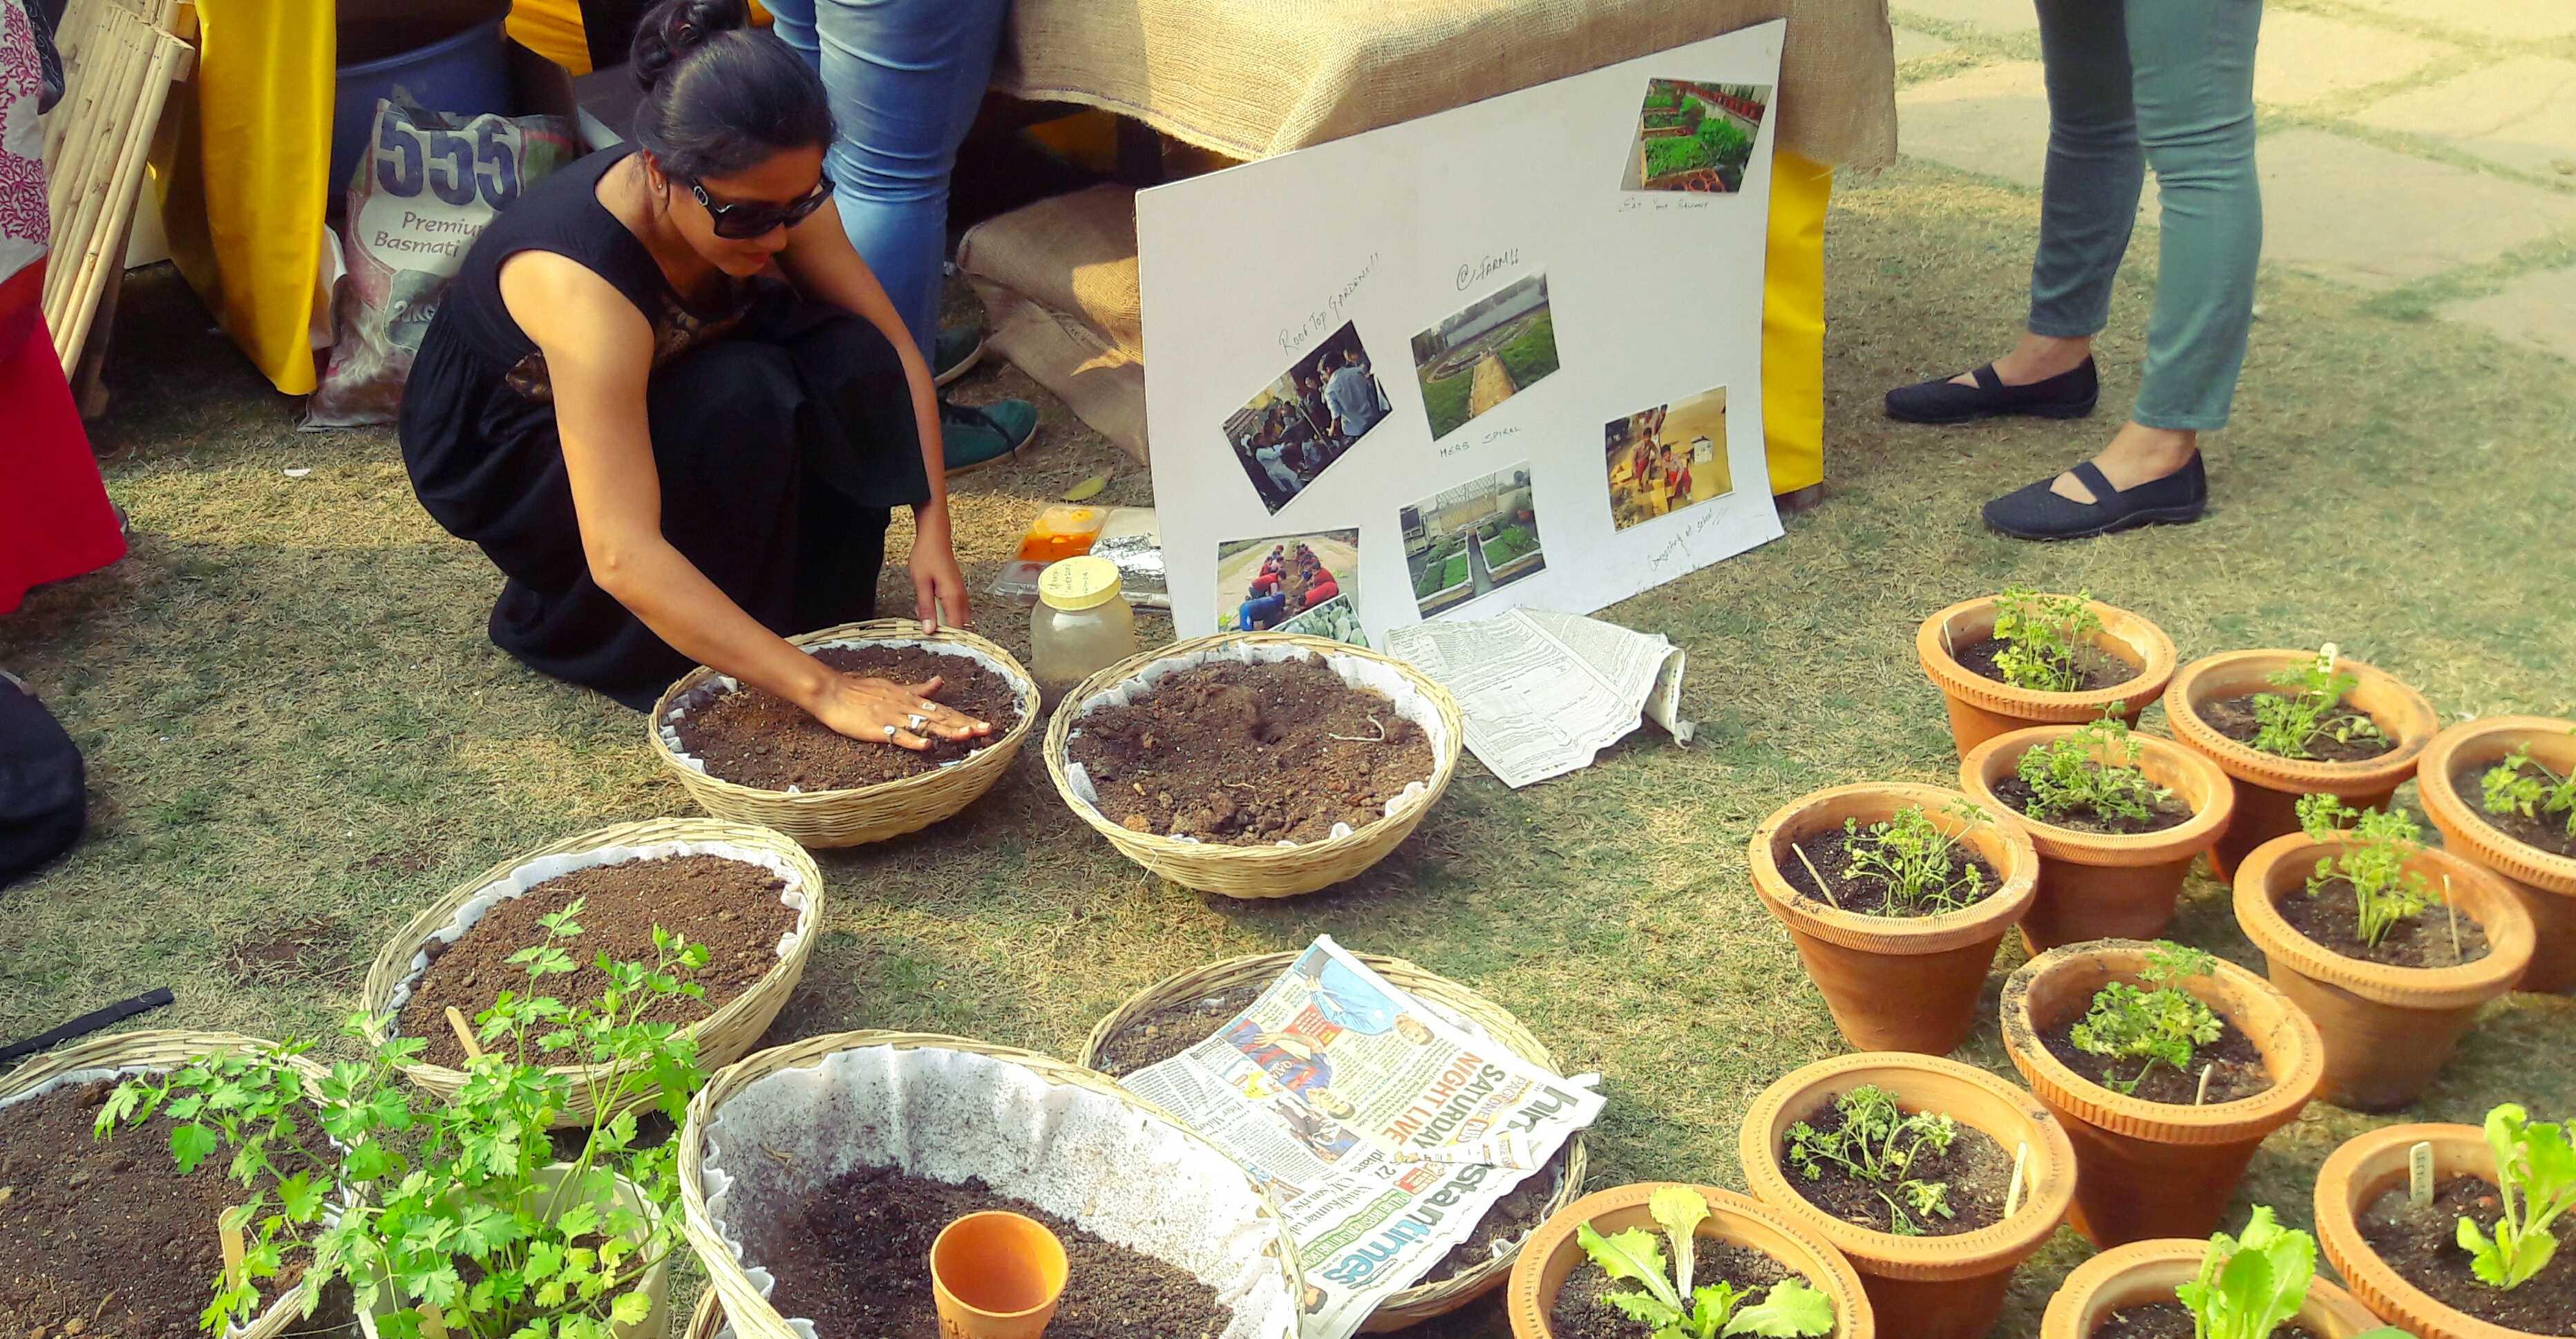 Fresh produce at organic fair by cse